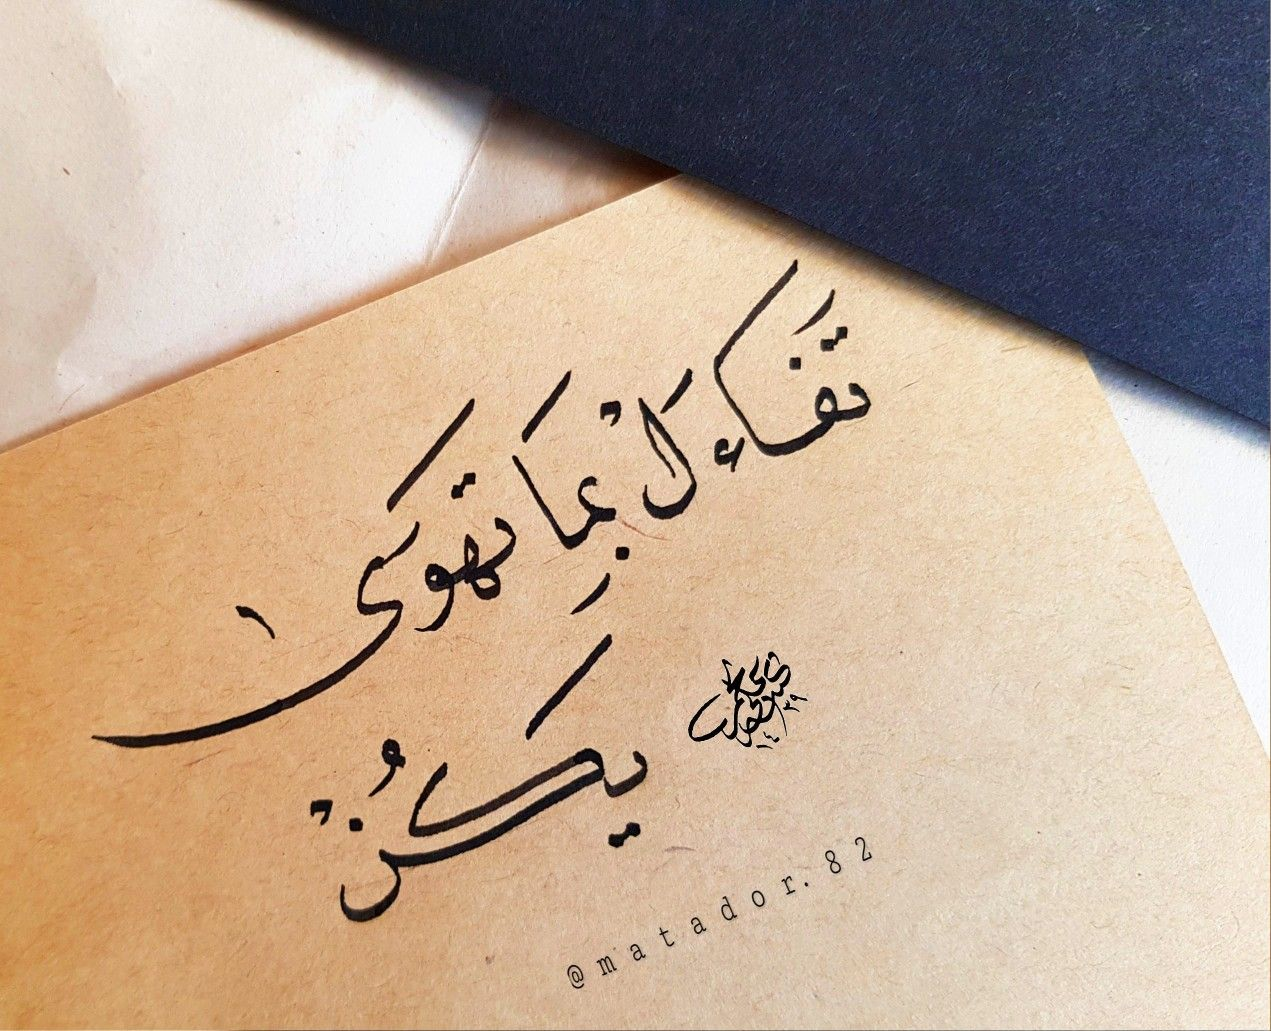 تفاءل بما تهوى يكن خواطر العراق خط عربي خطي Words Quotes Book Quotes Love Words